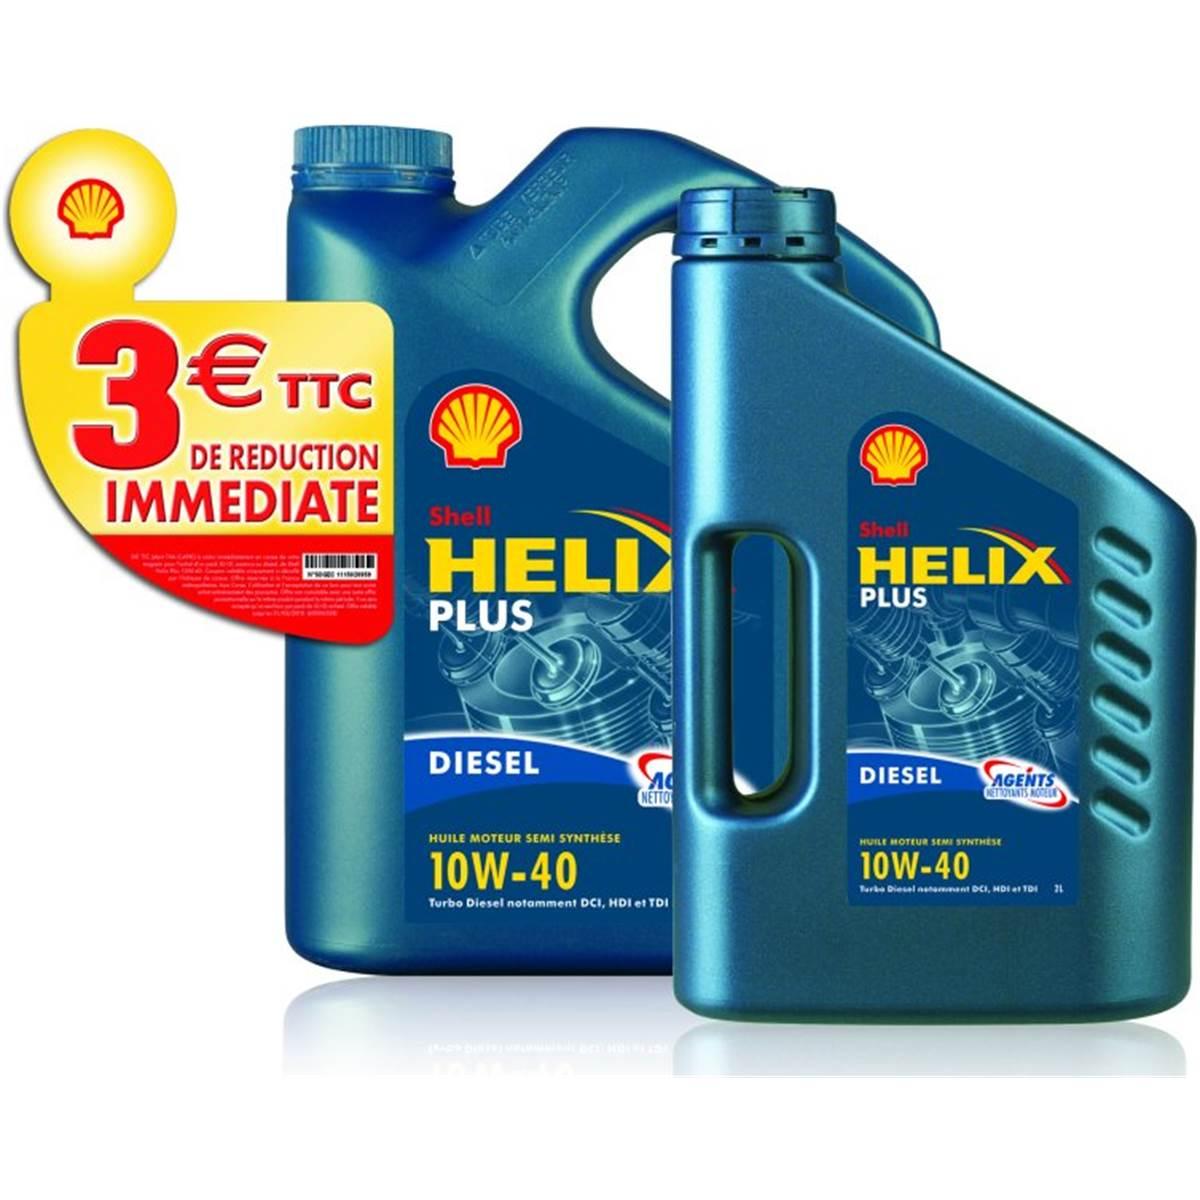 Huile semi-synthèse Shell Helix Diesel Plus 10W40 5L + 2L